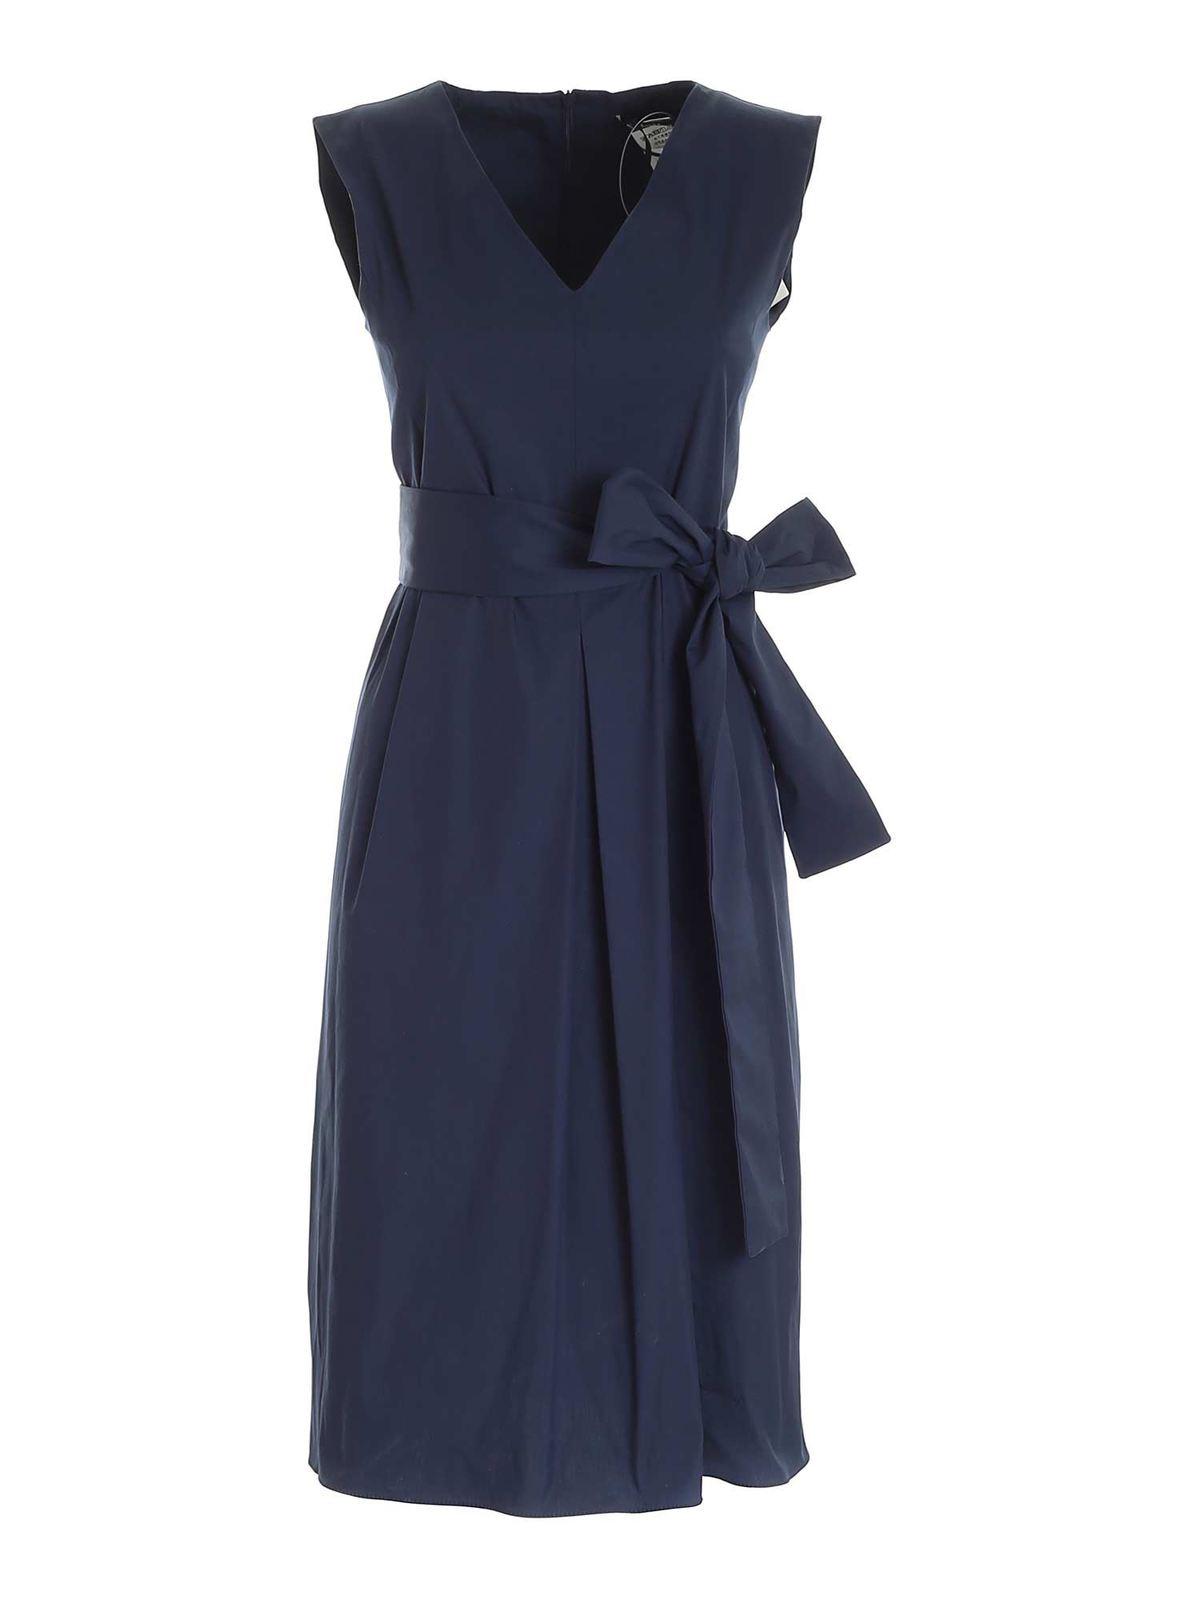 Max Mara Cottons ESTREMO DRESS IN BLUE